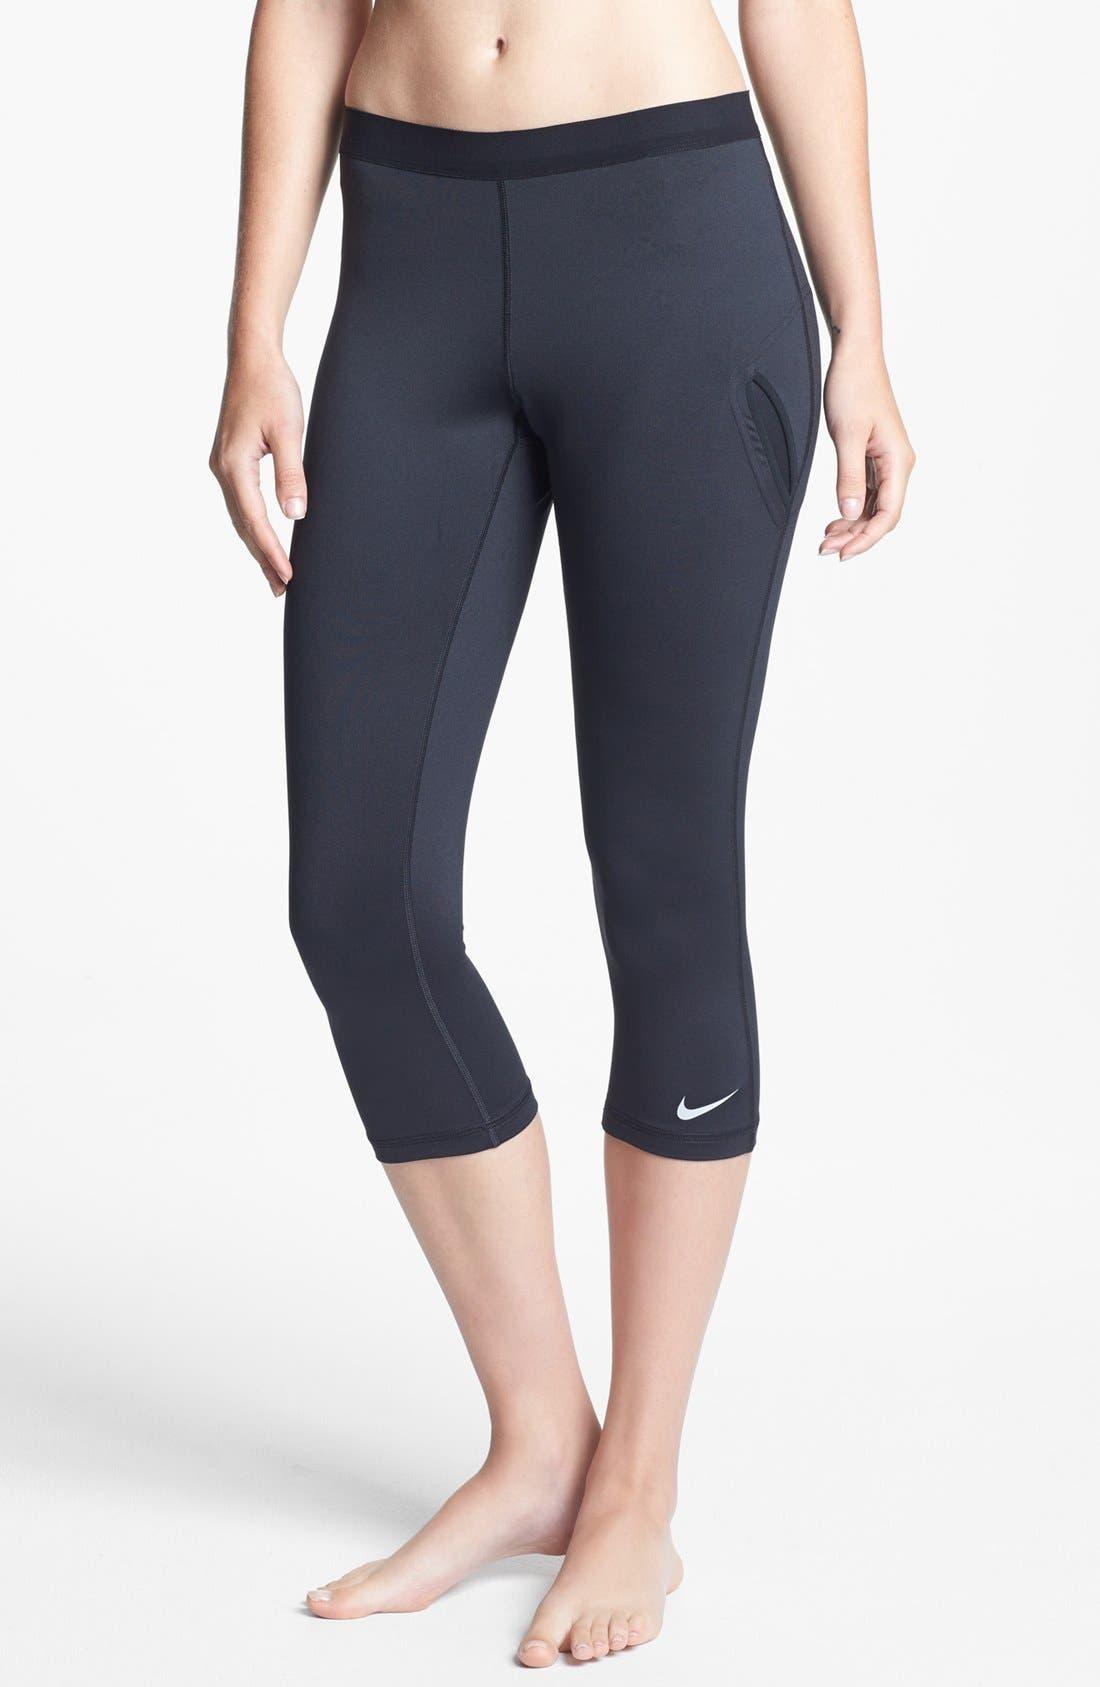 Main Image - Nike Capri Tennis Tights